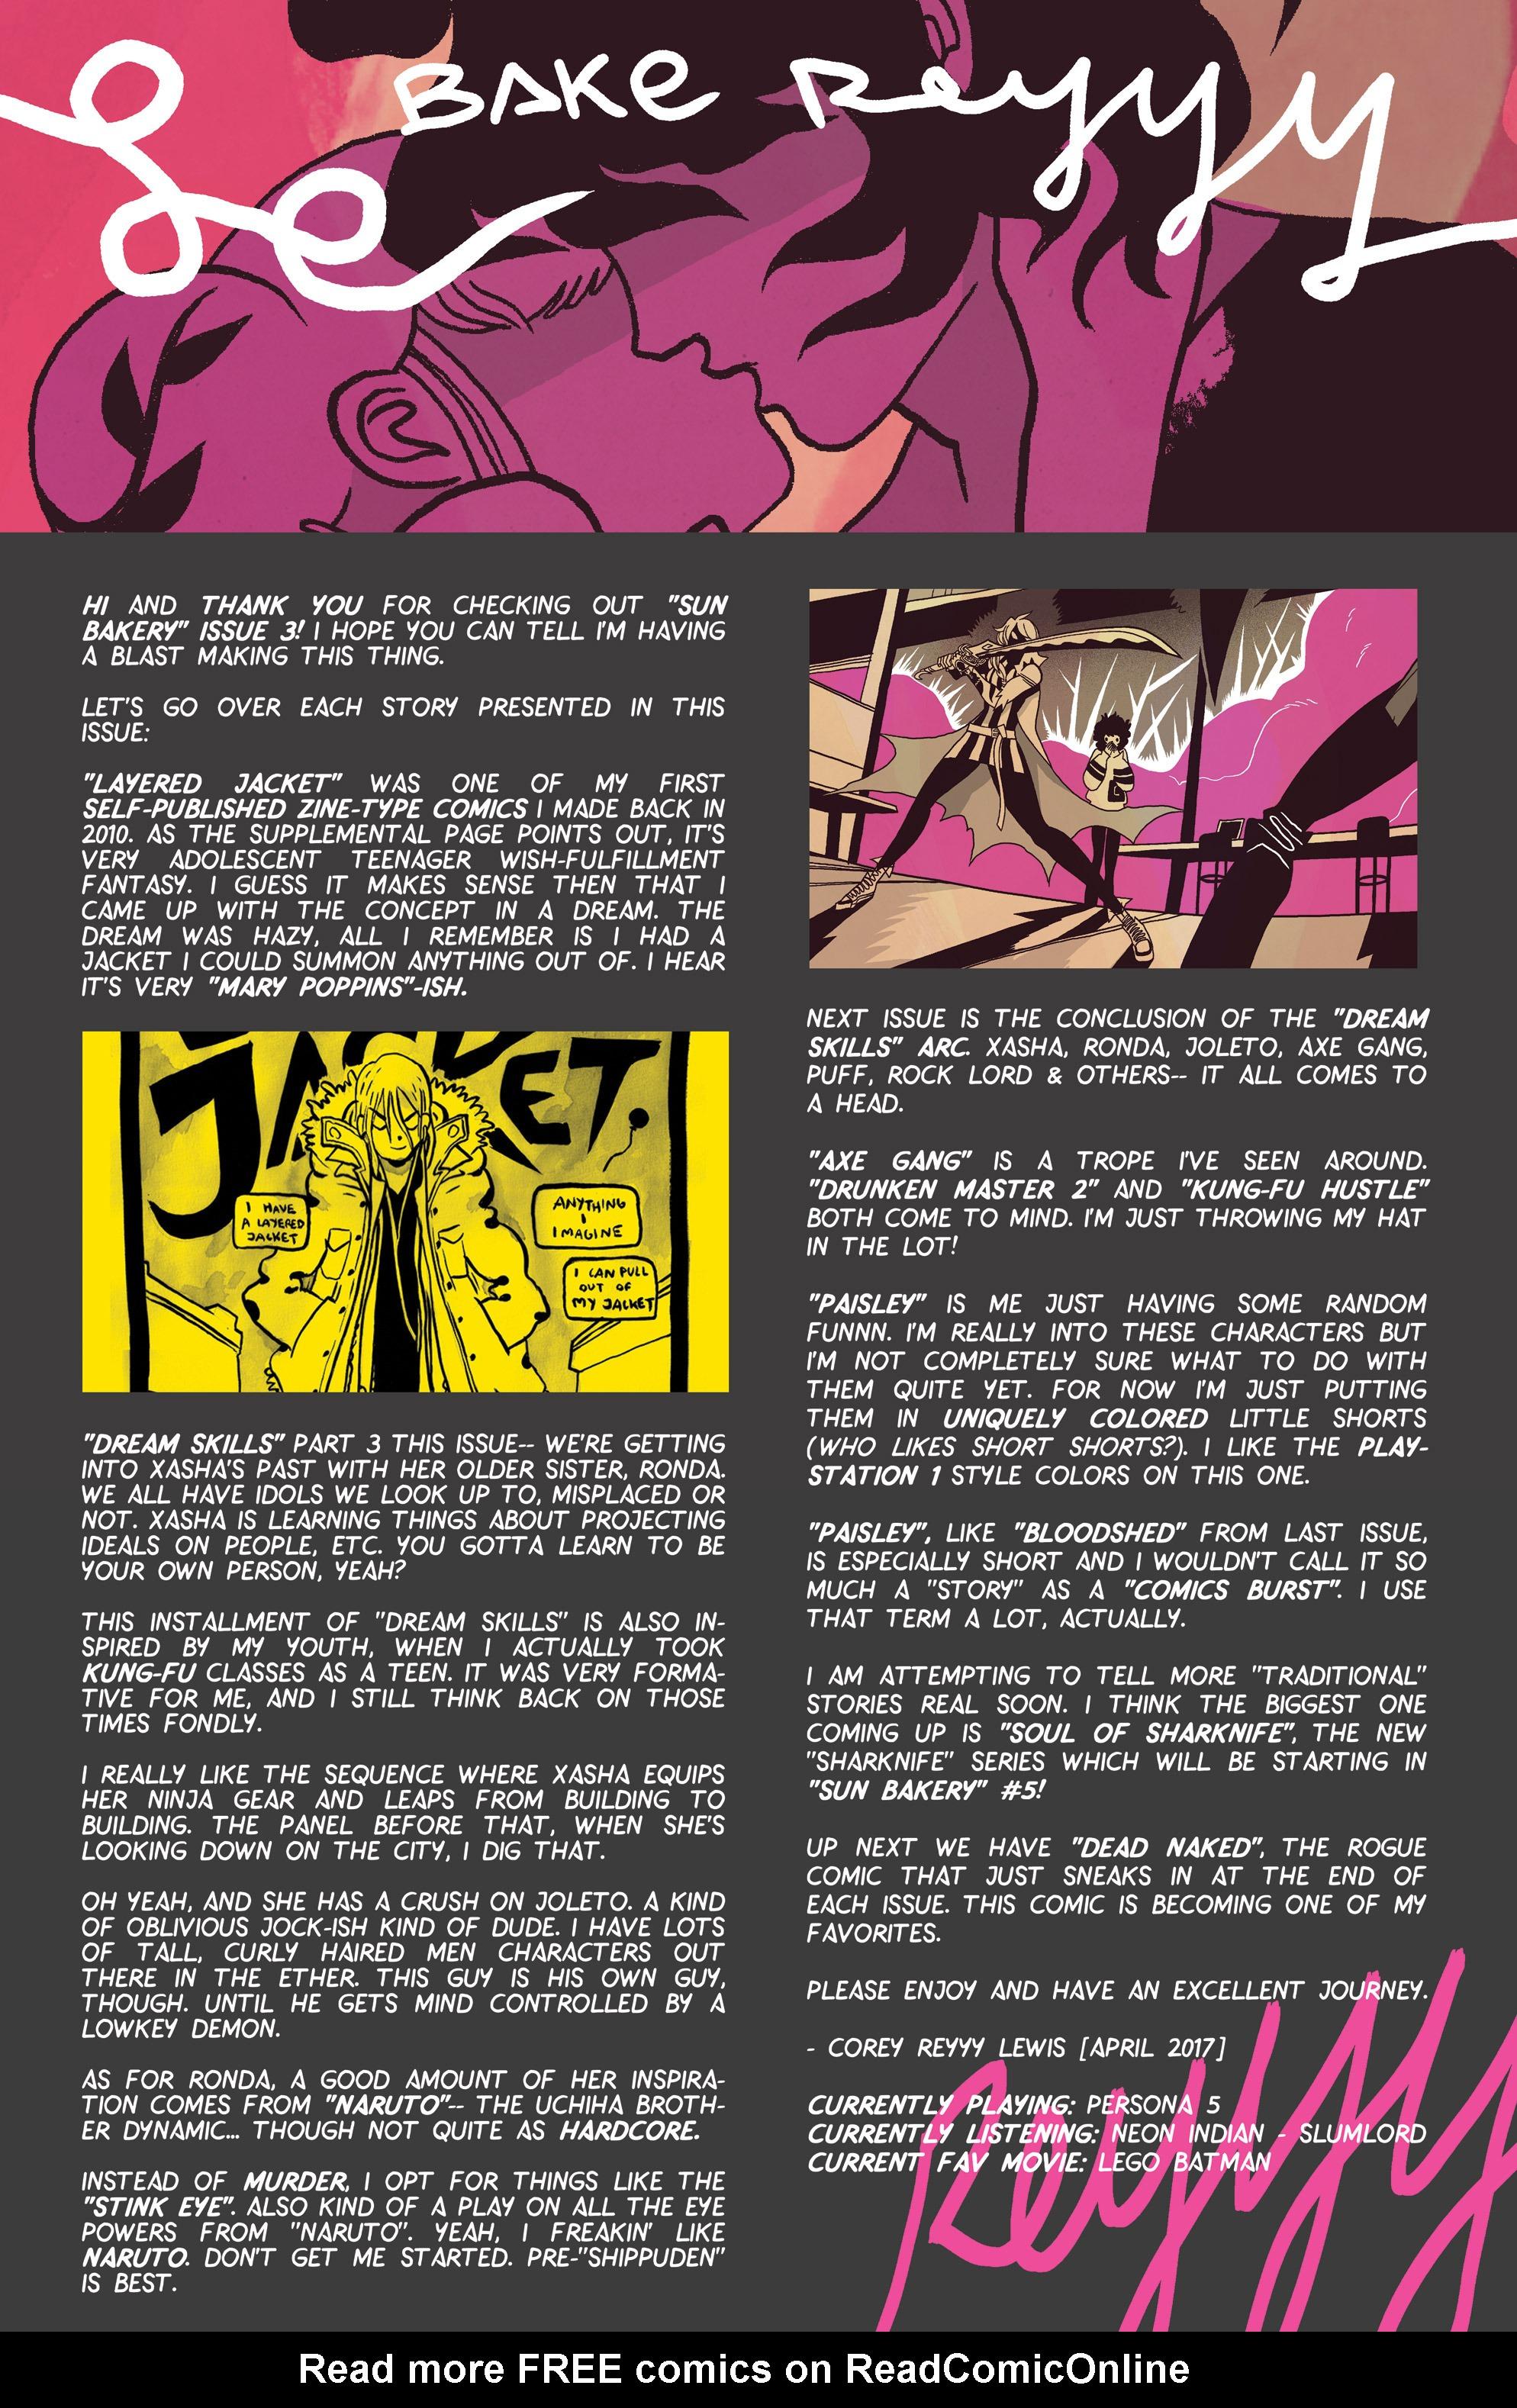 Read online Sun Bakery comic -  Issue #3 - 43